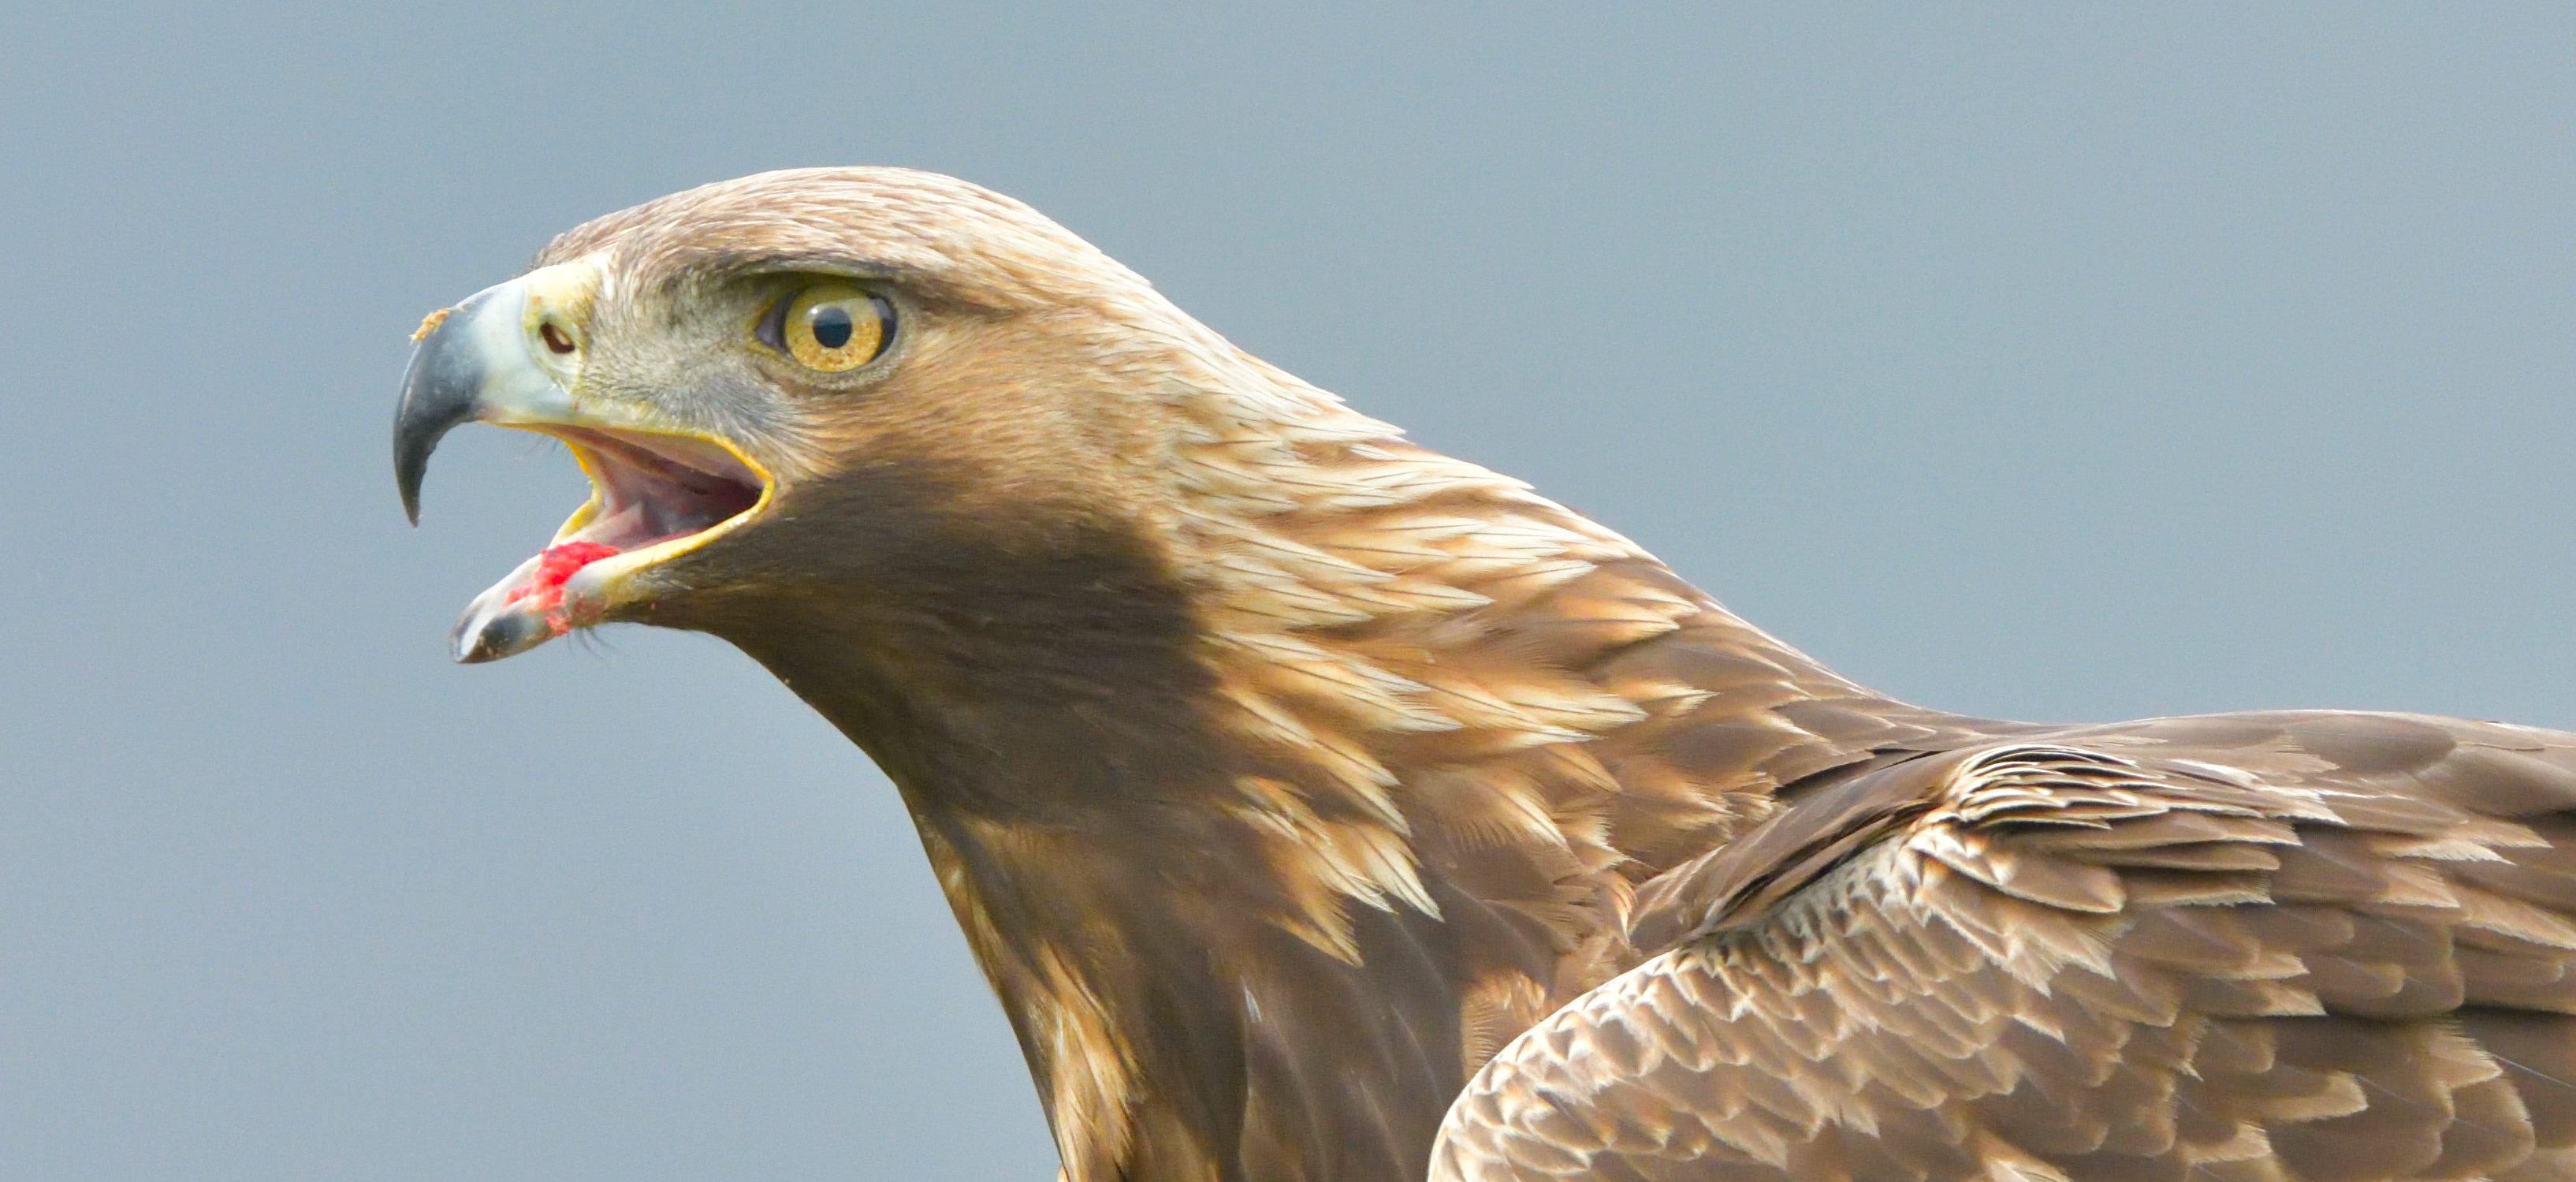 Wind Turbines Kill Thousands Of Birds Every Year. Shutterstock